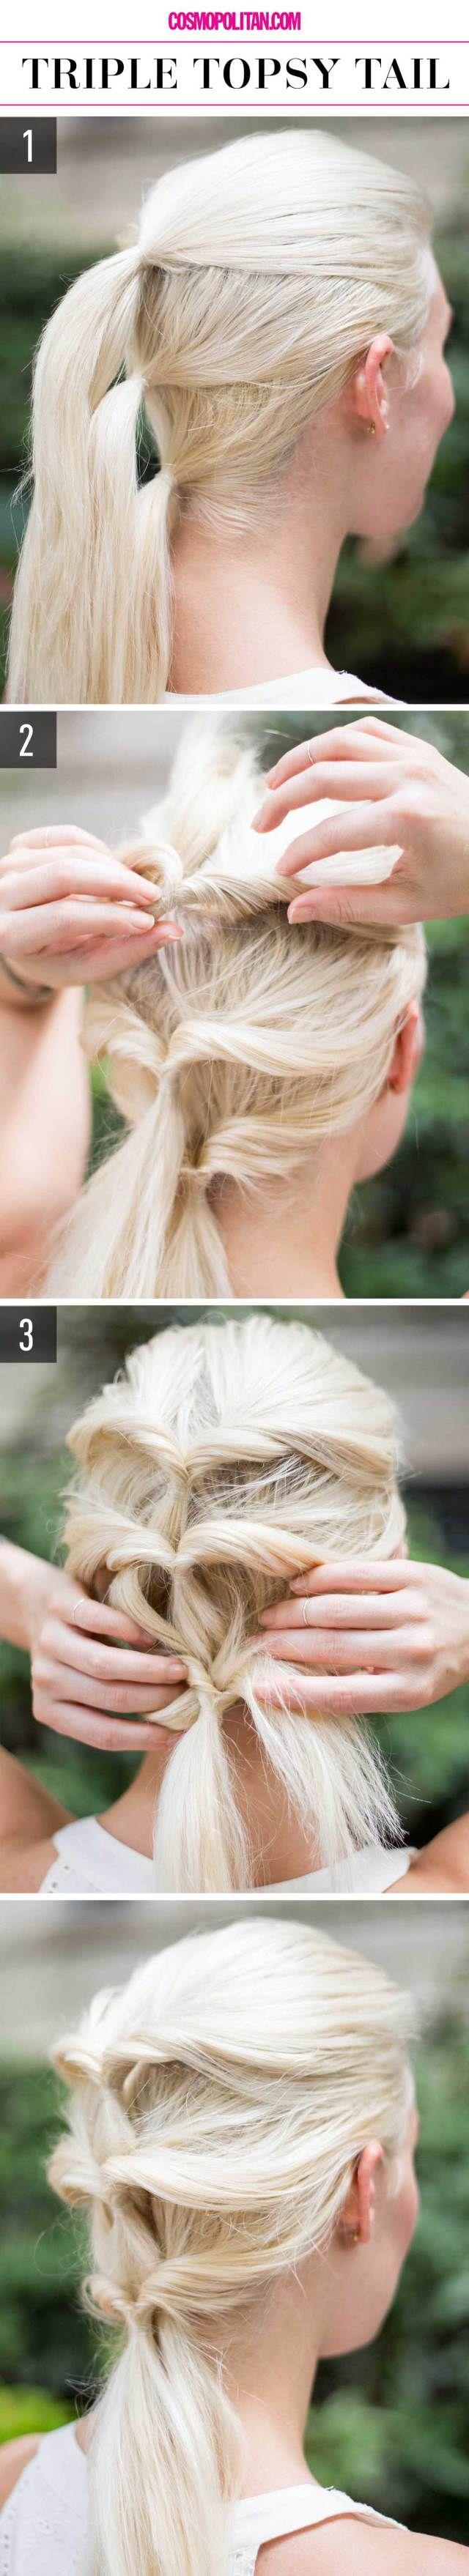 best Hair Style images on Pinterest  Hair dos Sonam kapoor